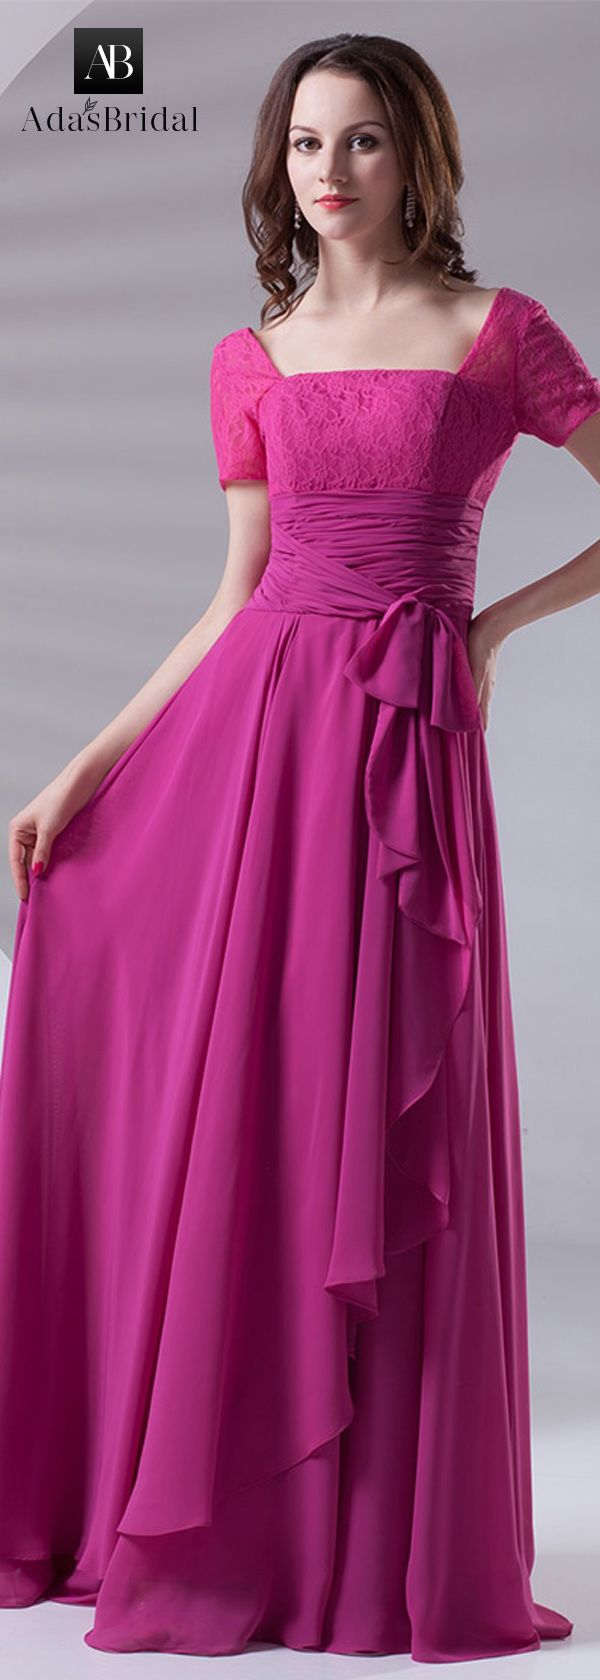 Mejores 95 imágenes de AdasBridal Mother Dresses en Pinterest